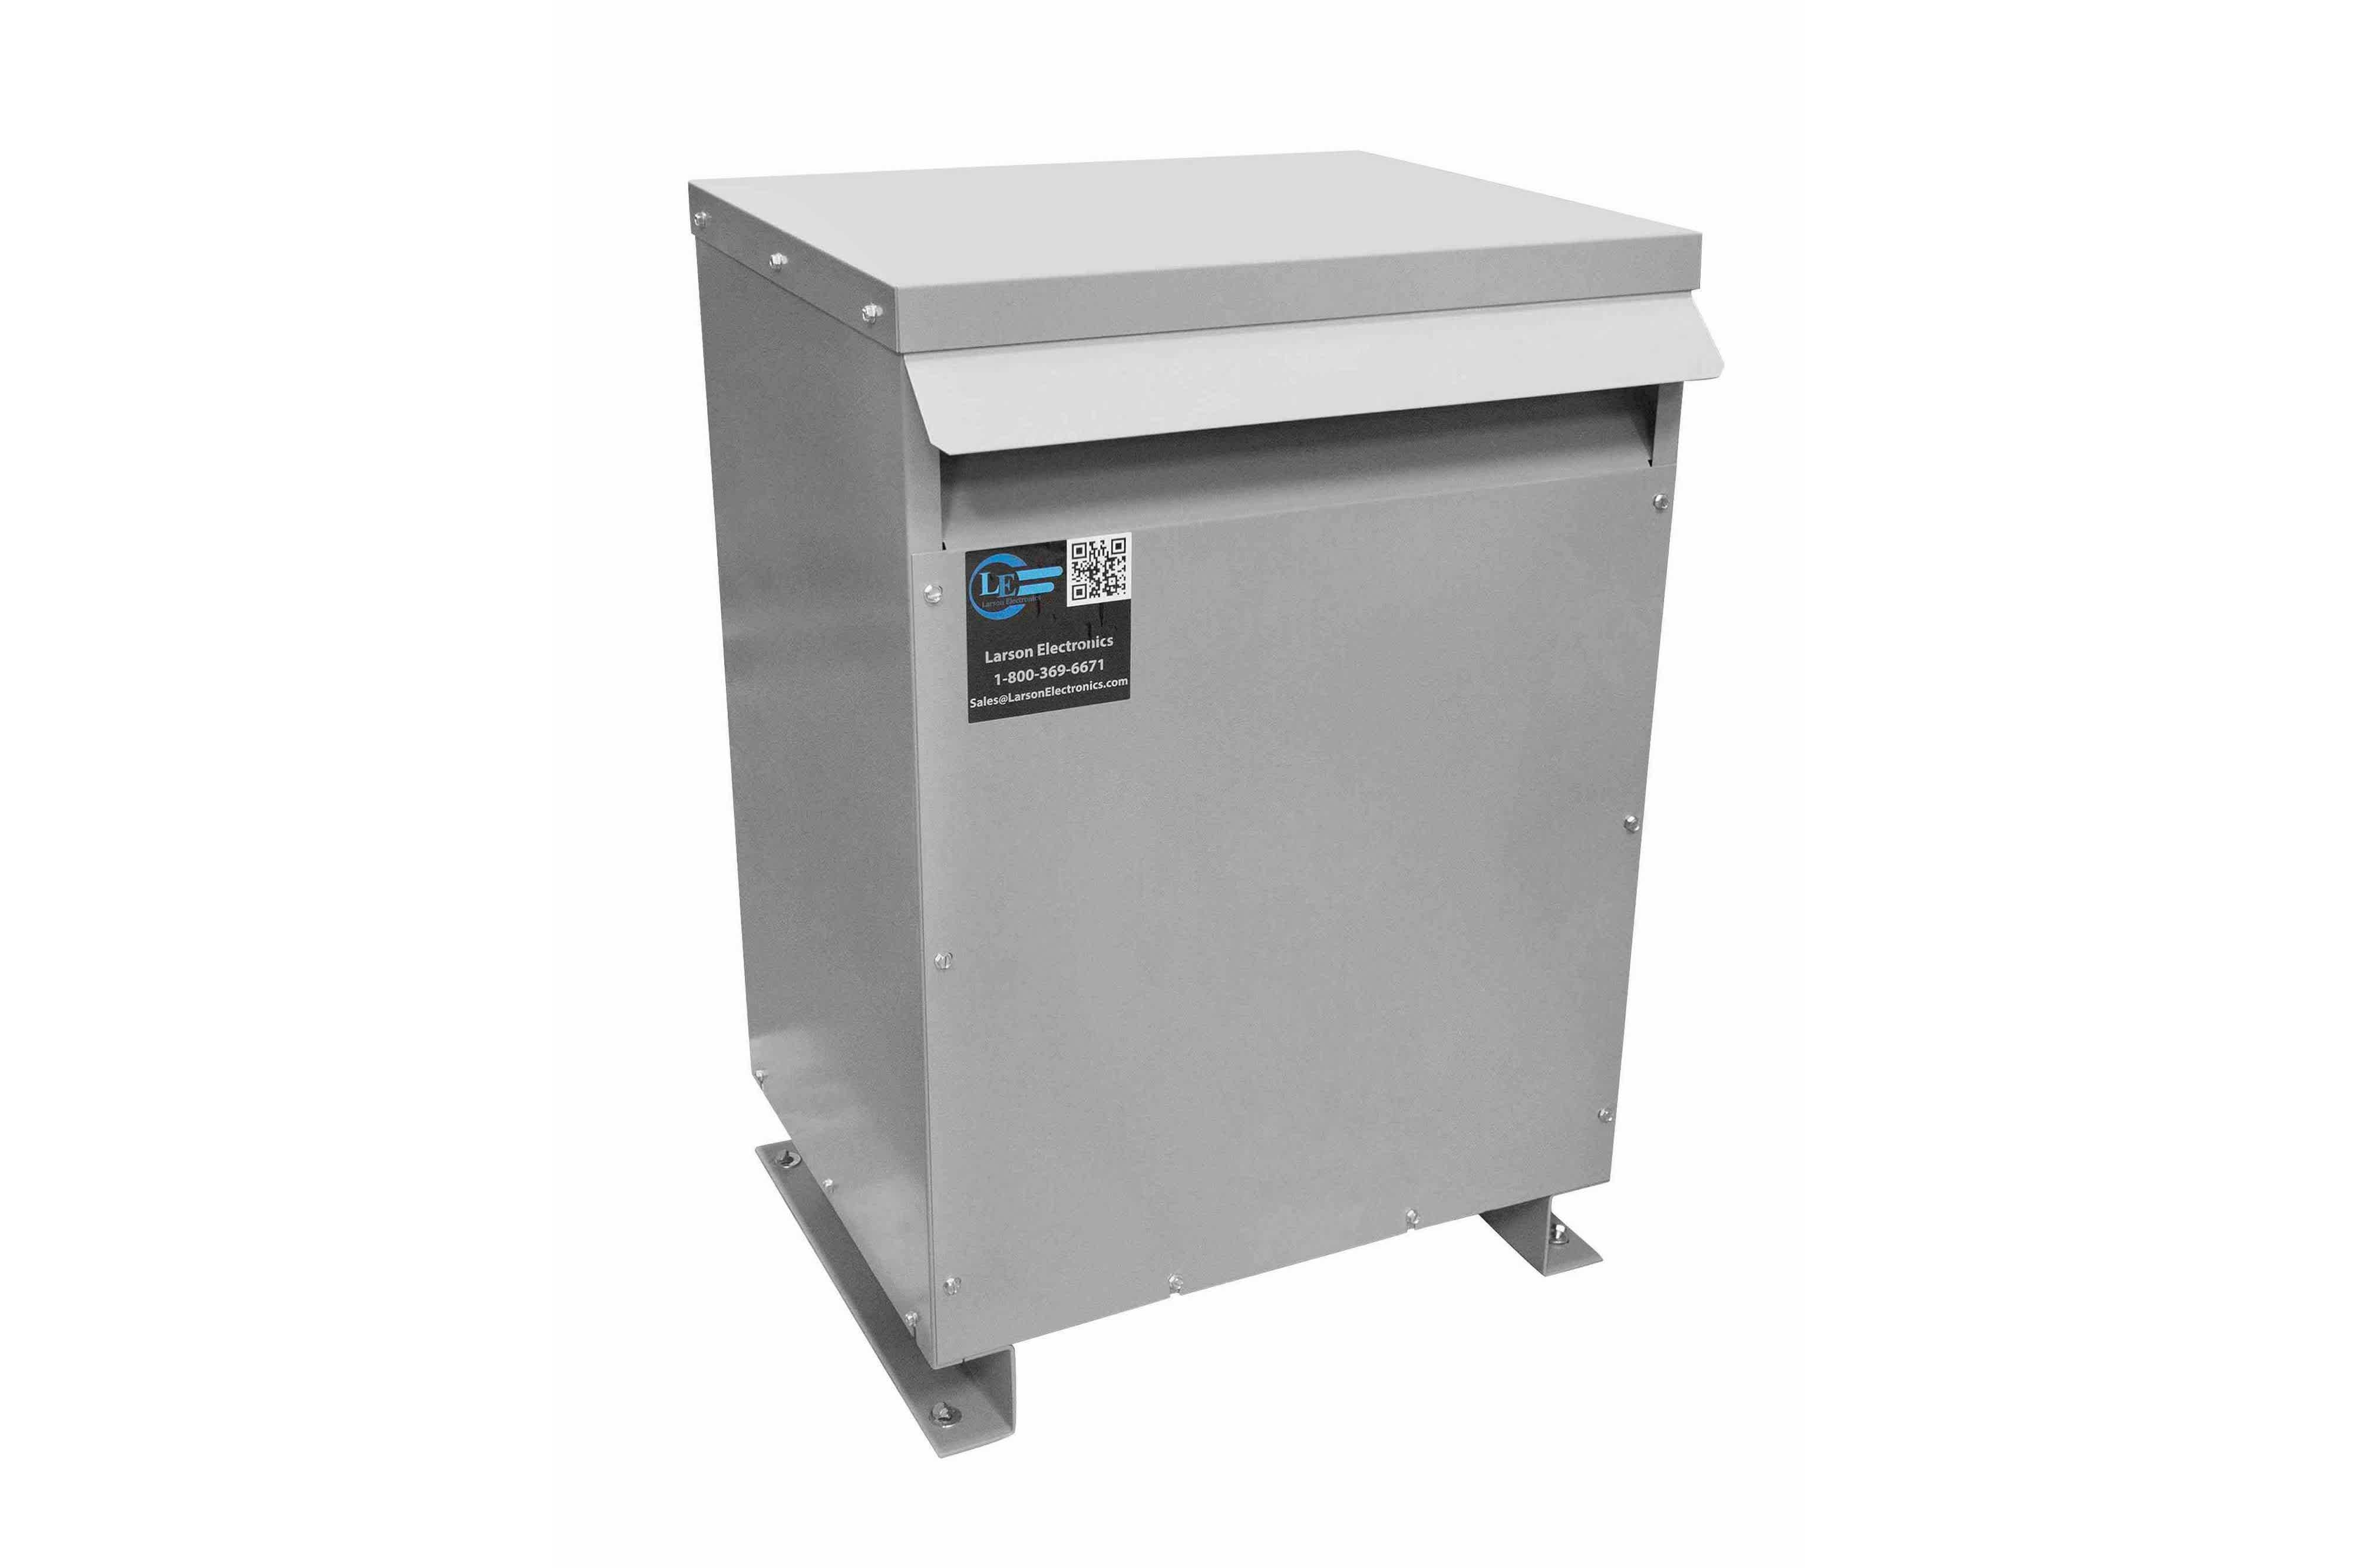 300 kVA 3PH Isolation Transformer, 380V Wye Primary, 600V Delta Secondary, N3R, Ventilated, 60 Hz